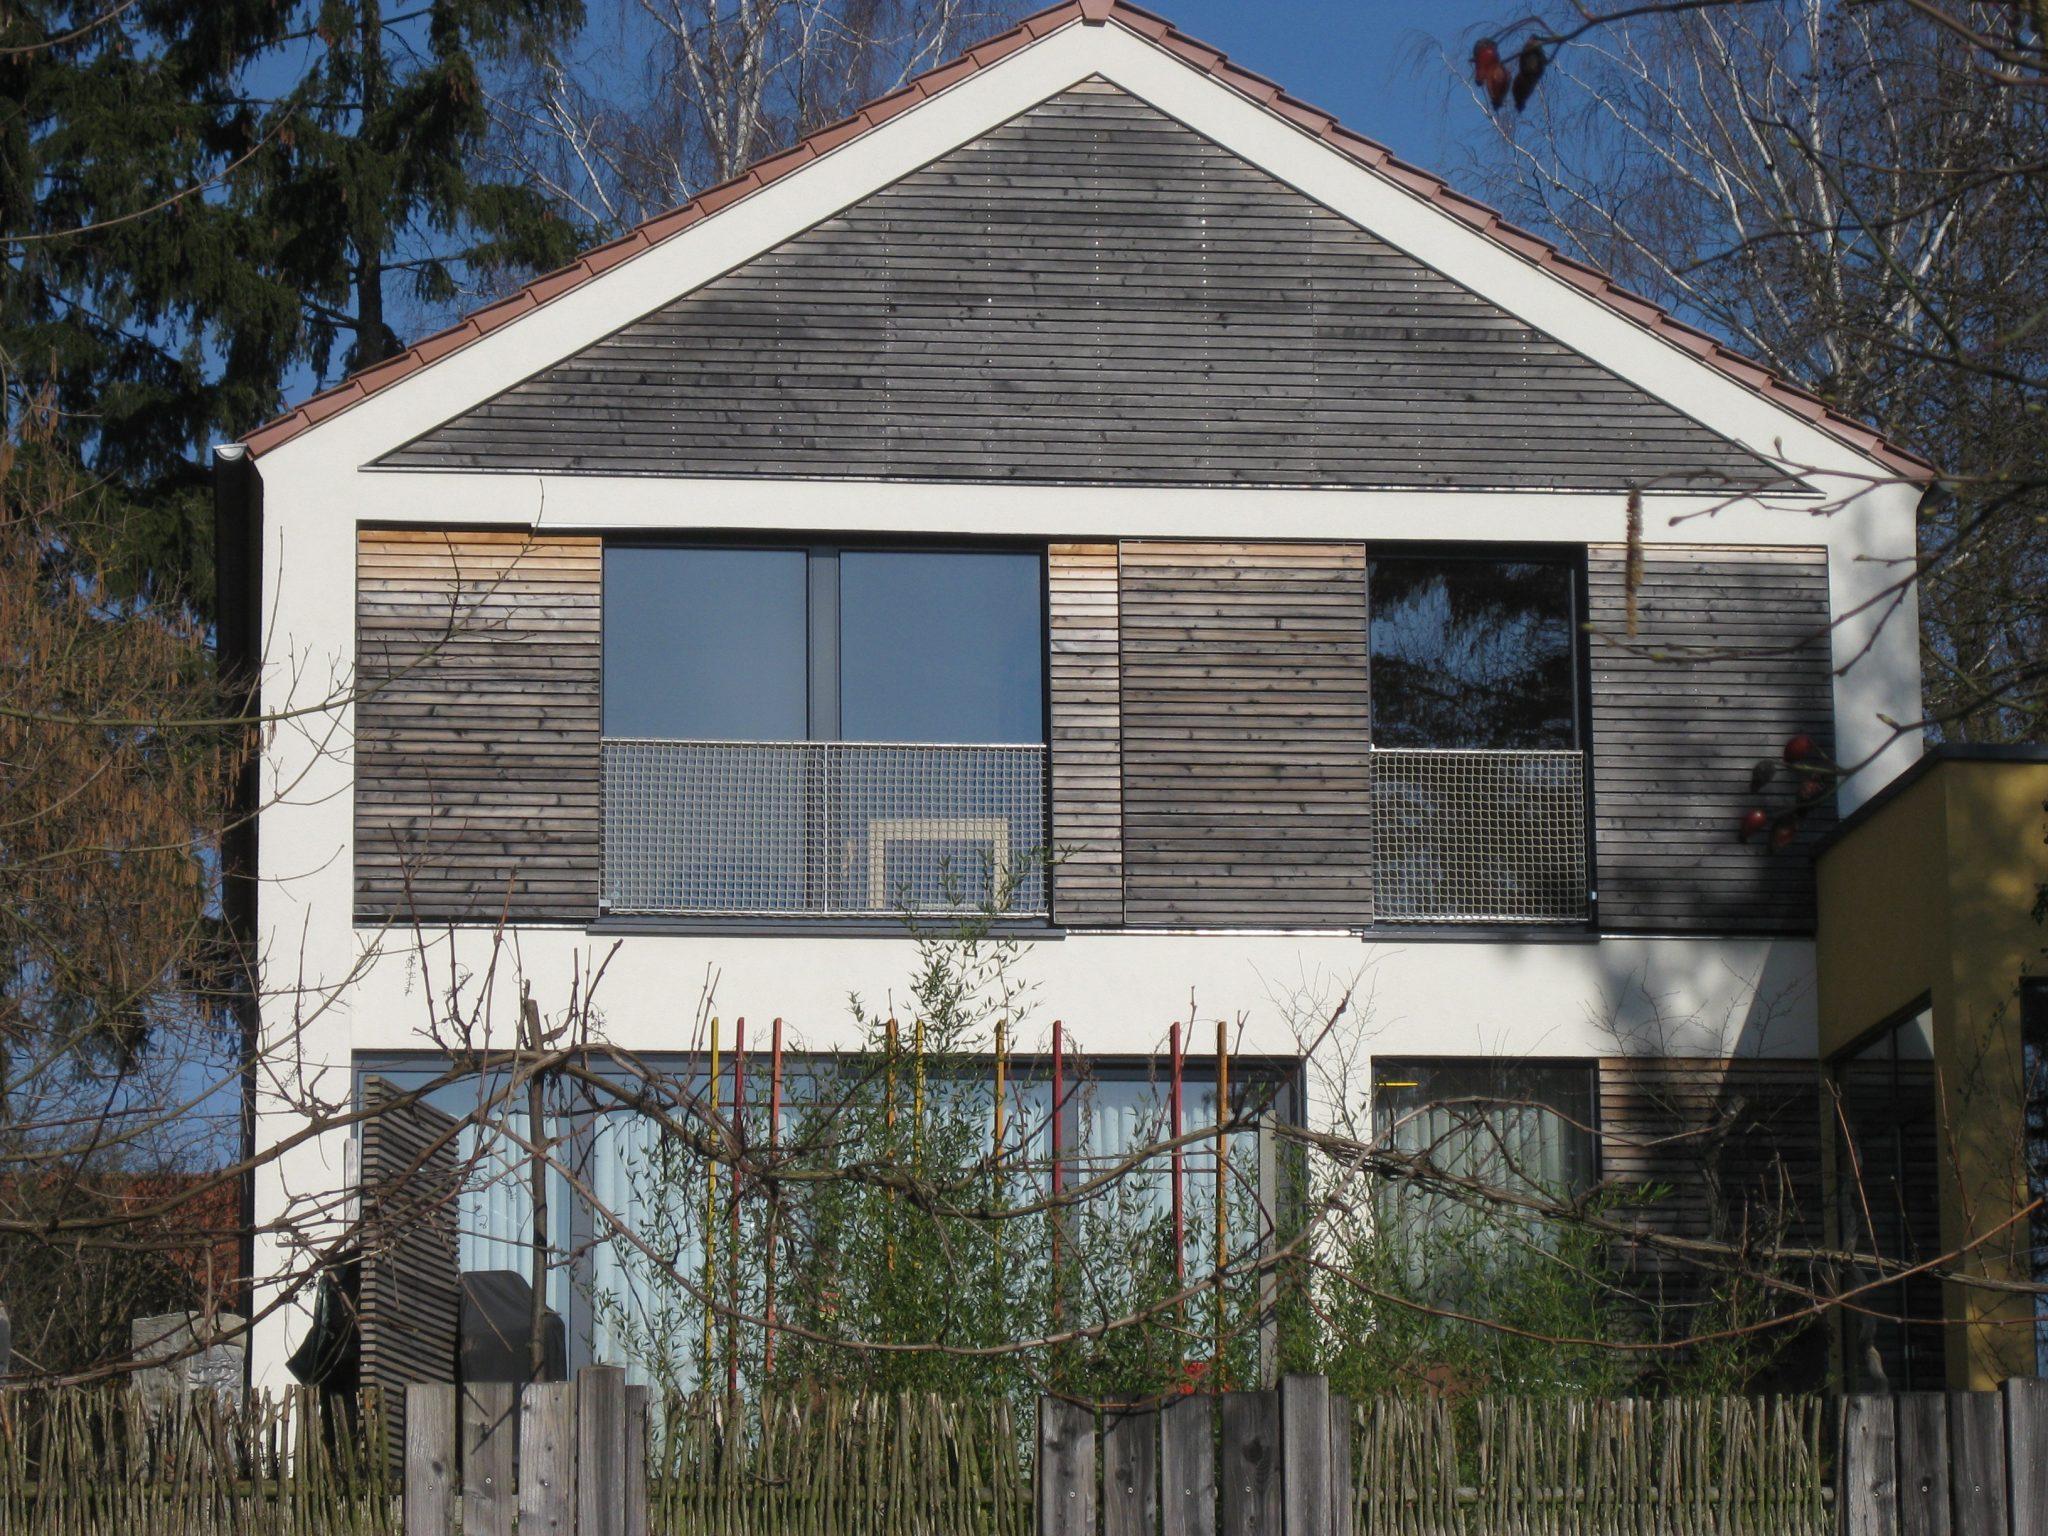 Neubau einfamilienhaus am hang n rnberg mk architektur for Neubau einfamilienhaus